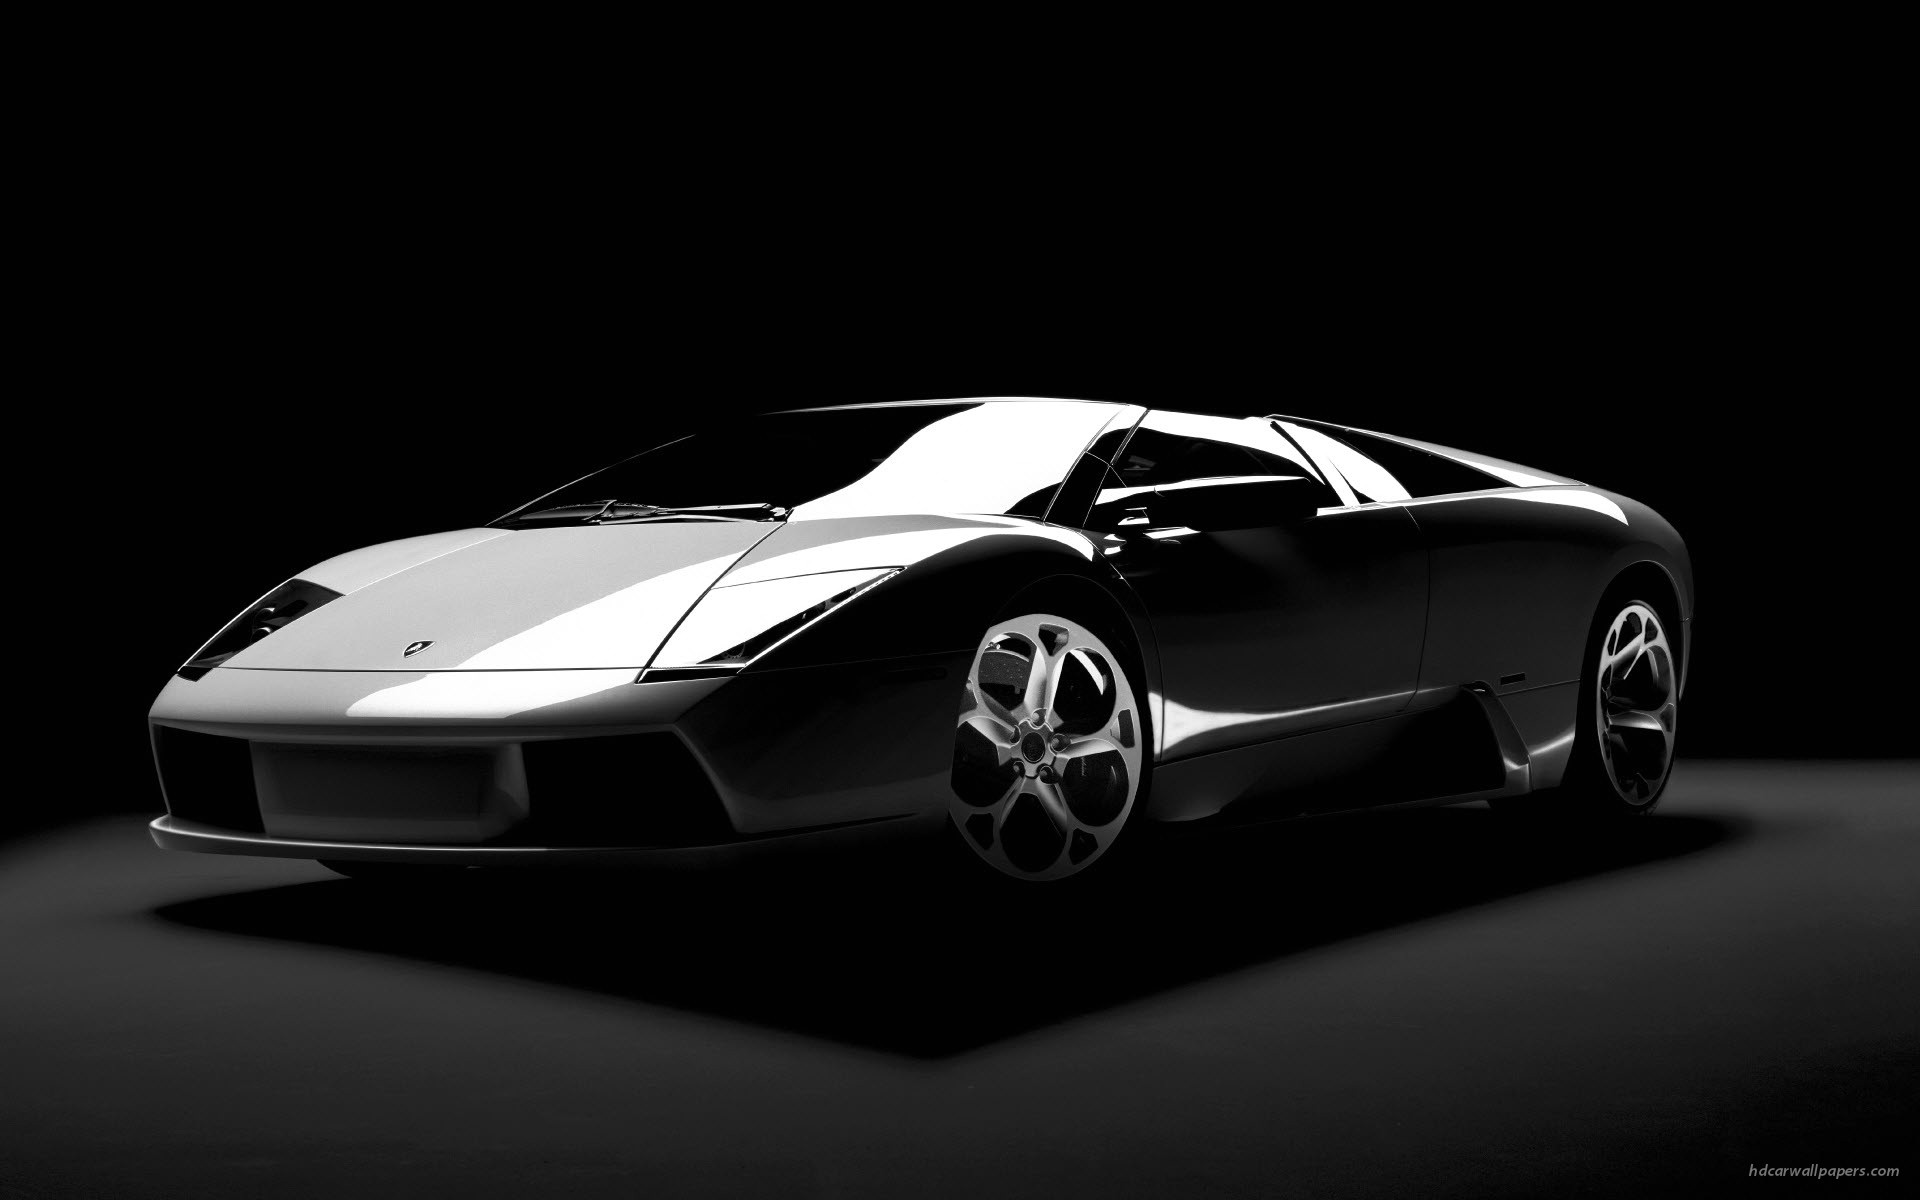 Lamborghini All New Wallpapers HD Wallpapers 1920x1200